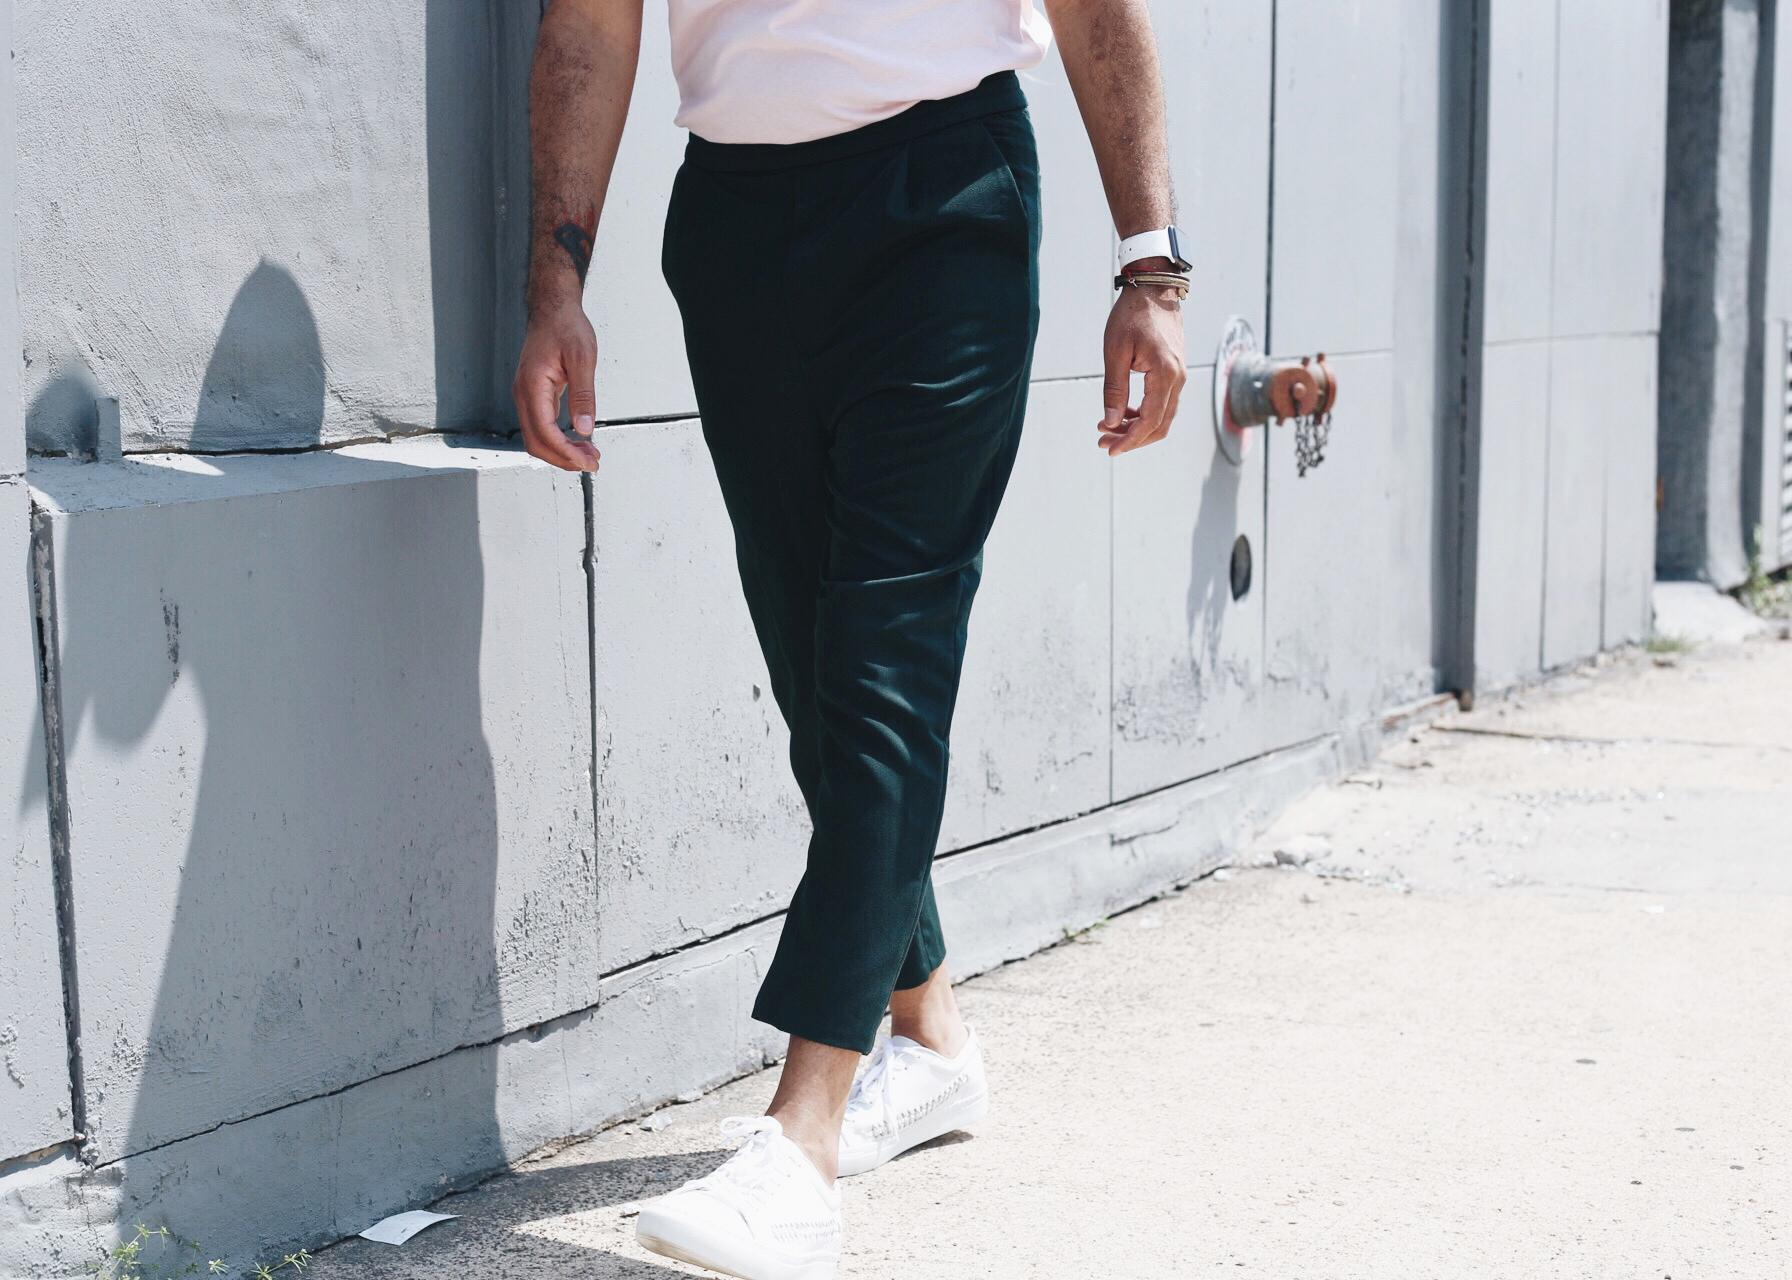 green-cropped-pants-pink-tshirt-walk-cropped.jpg